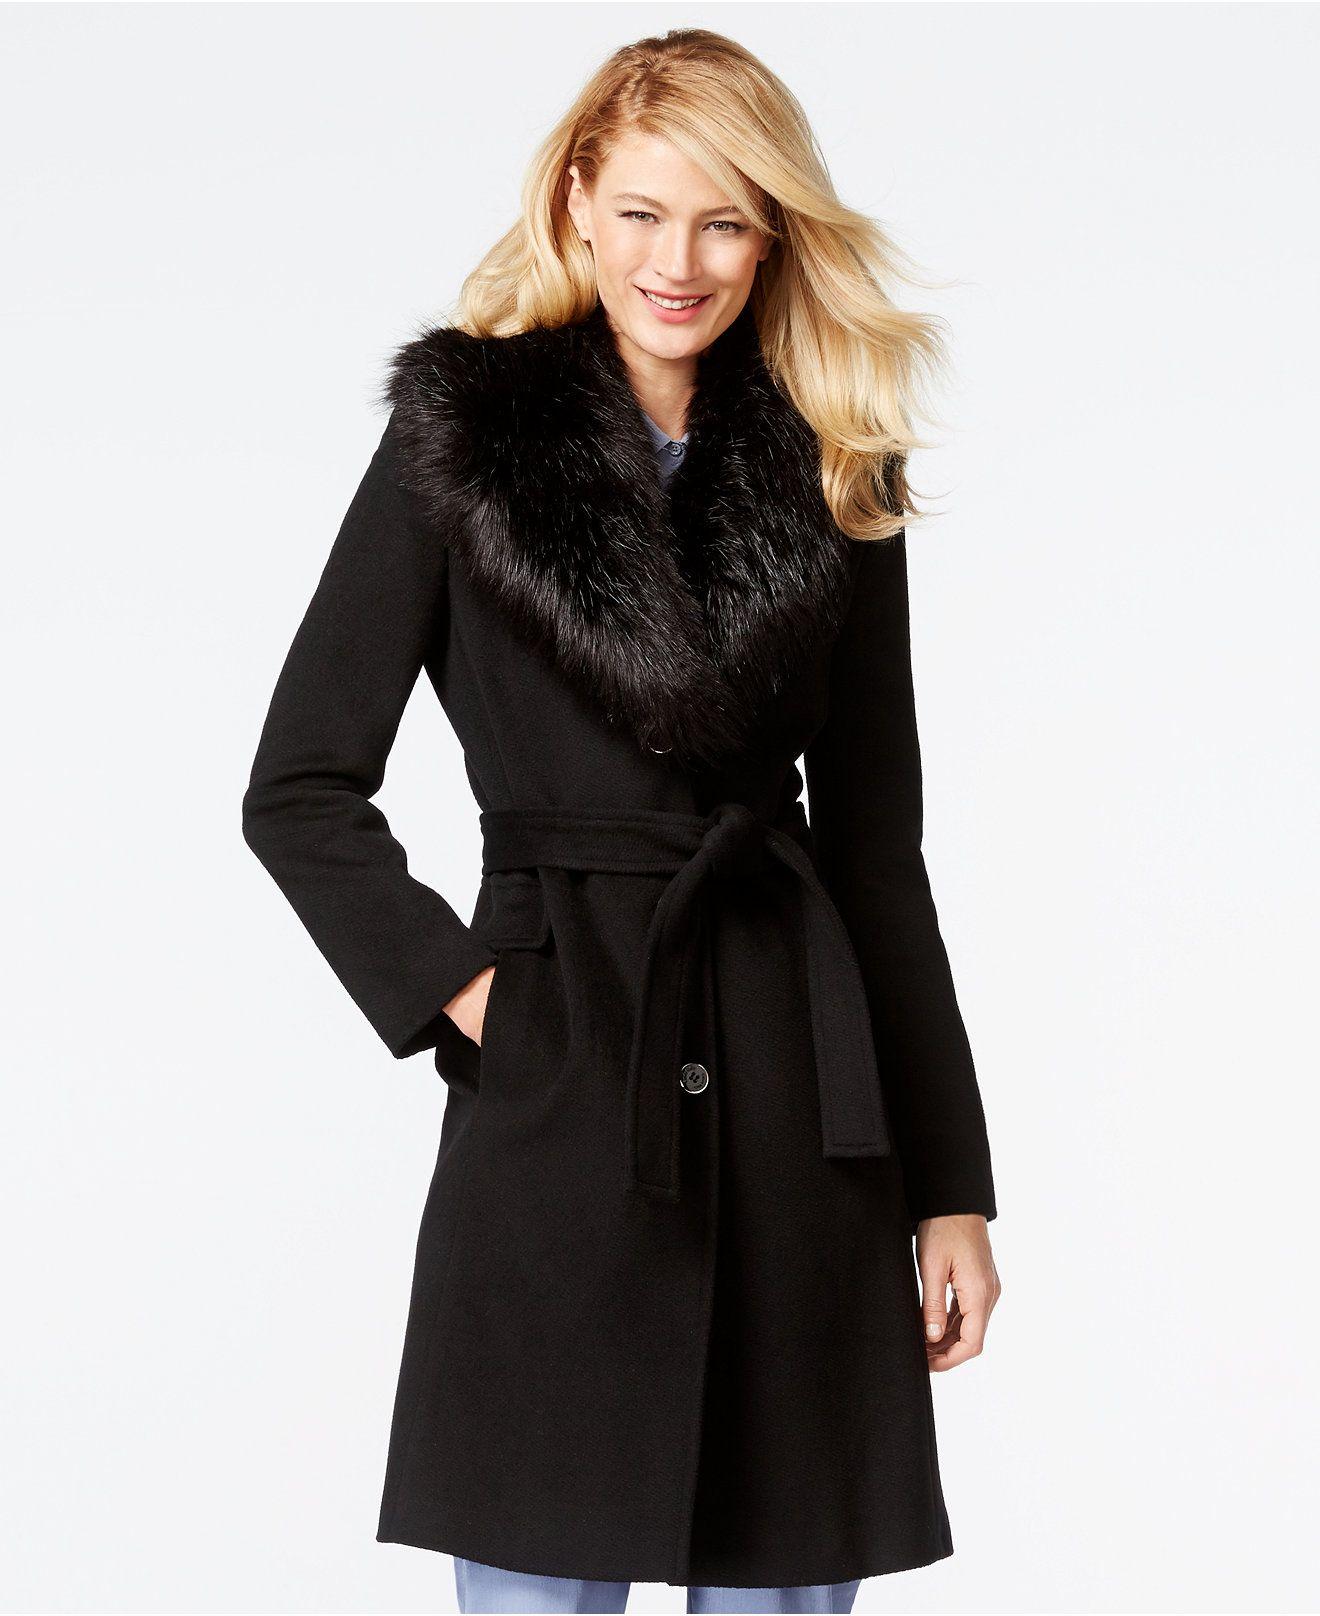 Calvin Klein Faux-Fur-Collar Walker Coat - Coats - Women - Macy's ...